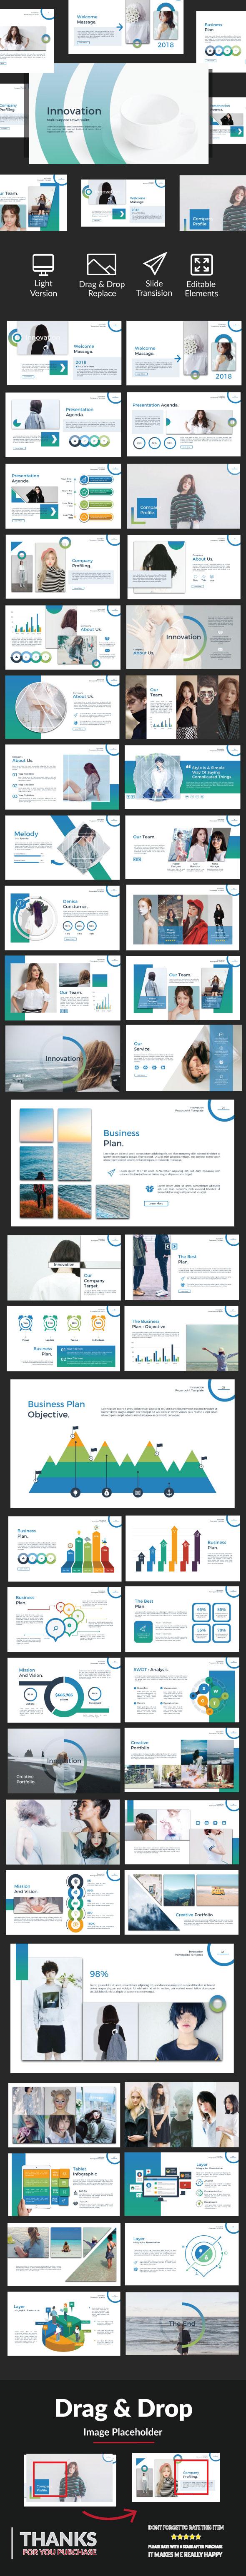 Innovation Powerpoint - PowerPoint Templates Presentation Templates